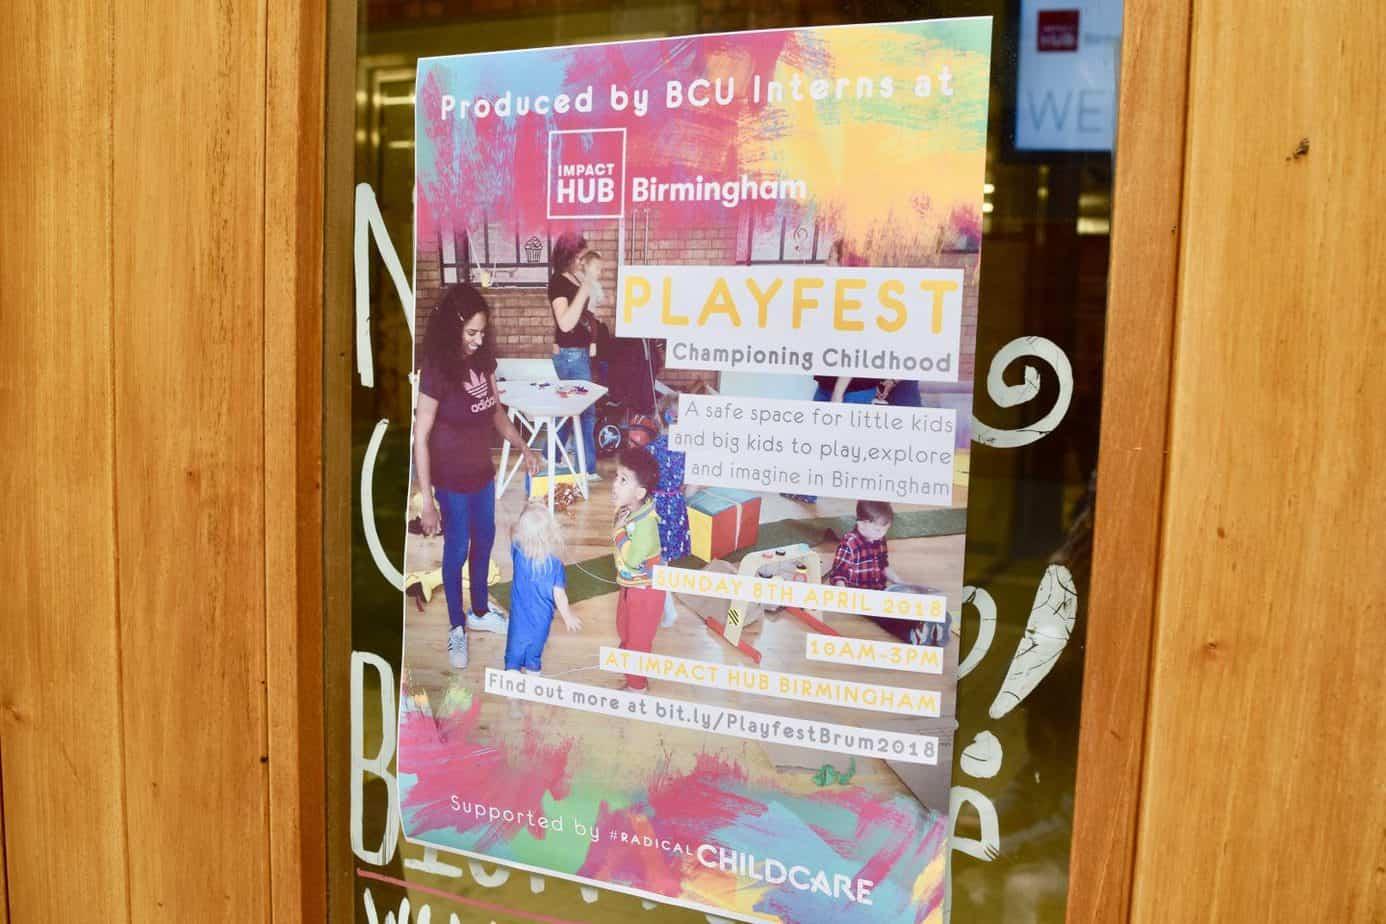 Poster for Platfest at Impact Hub Birmingham